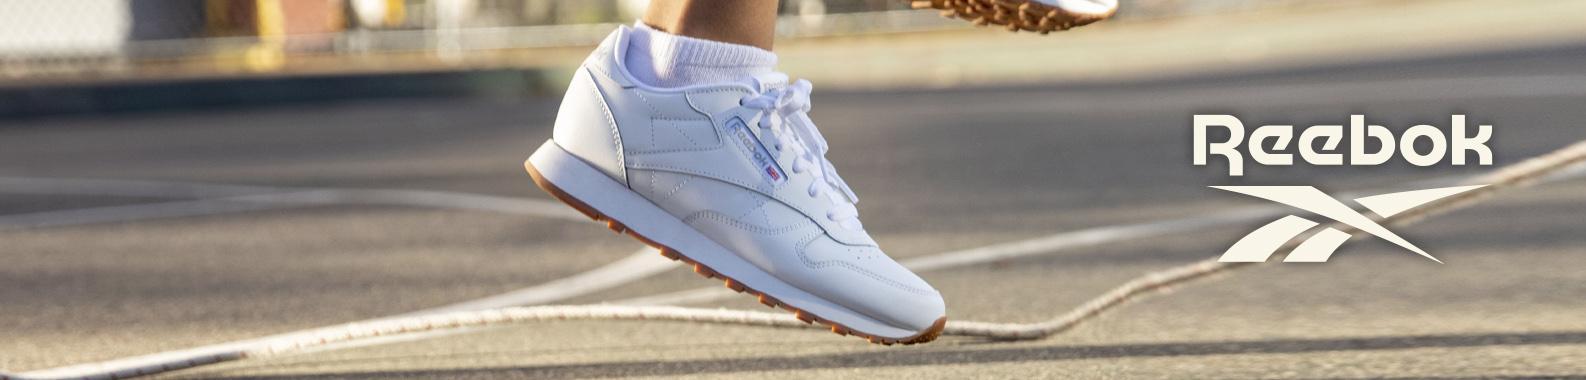 Reebok brand header image